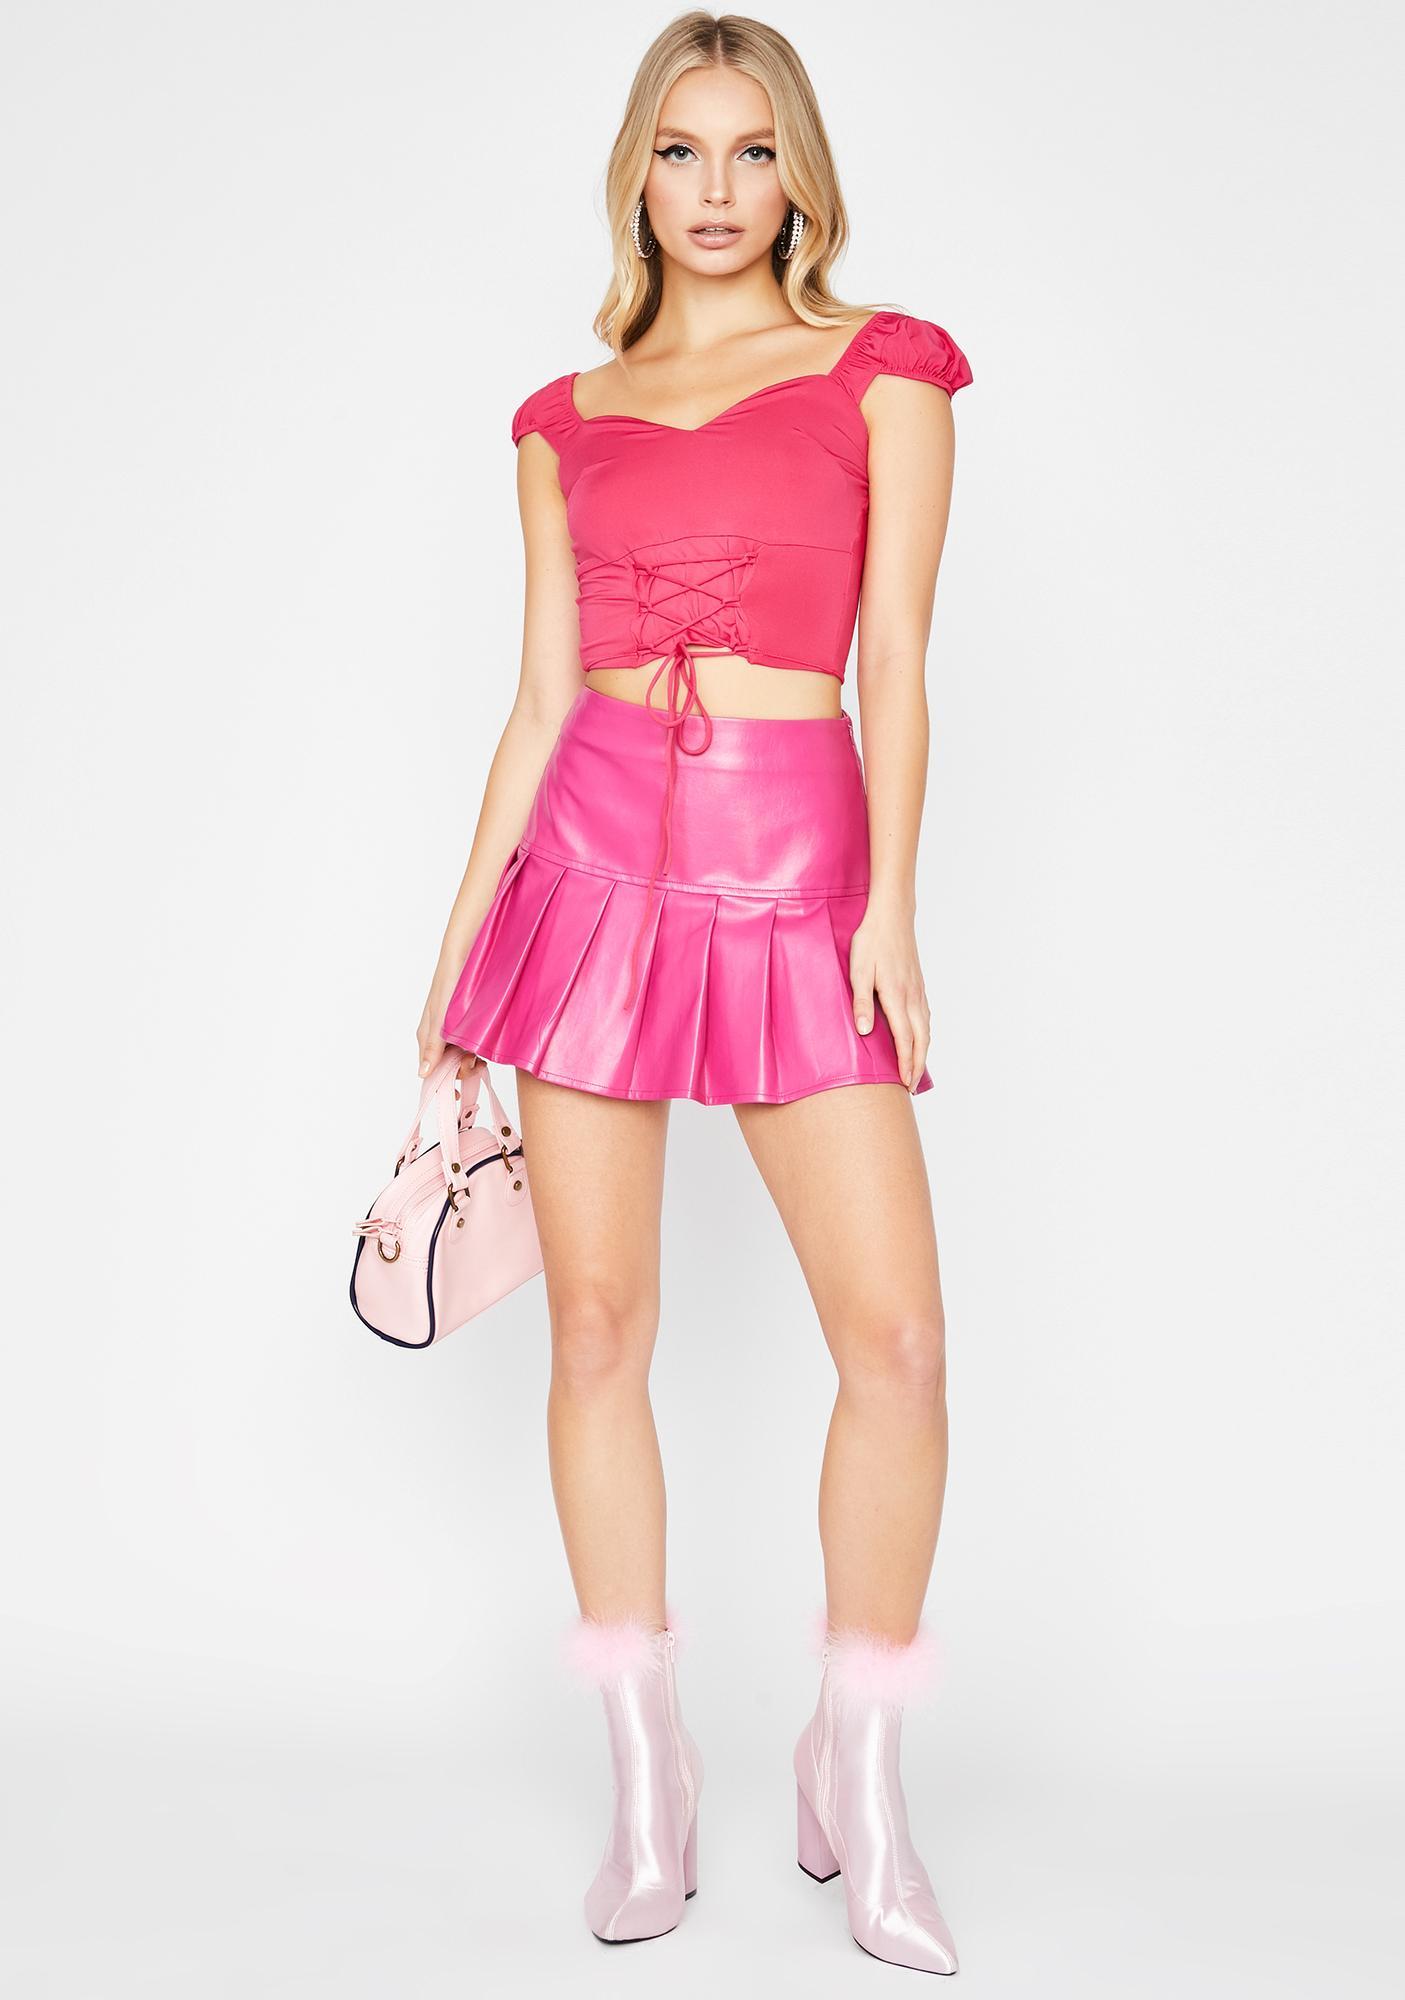 Sweet Trendy Heaux Lace-Up Top